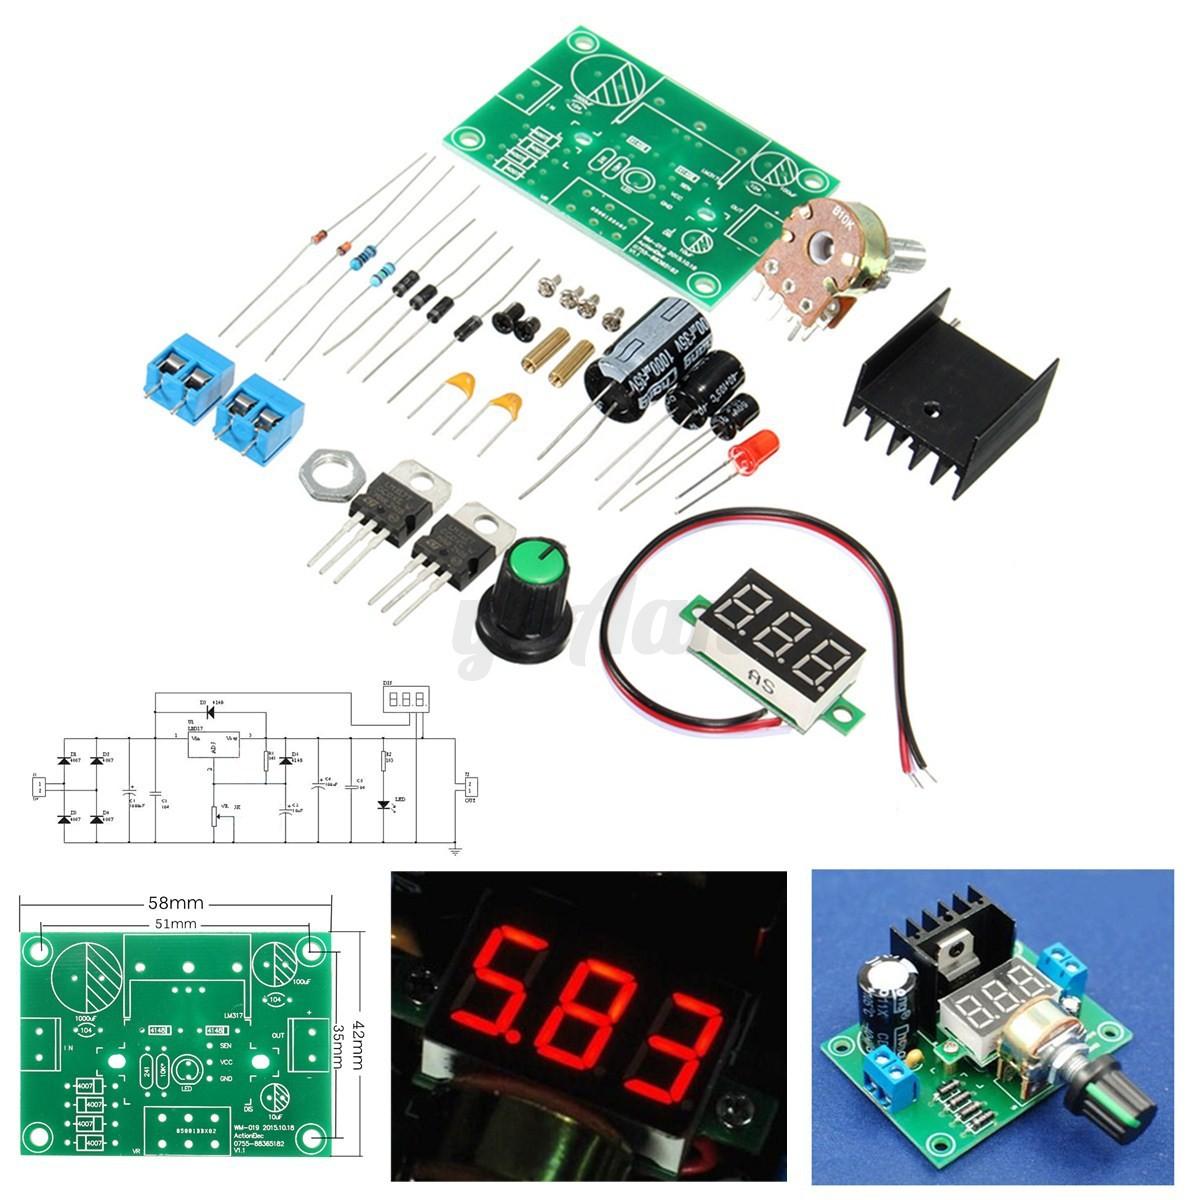 Lm317 Adjustable Voltage Regulator Step Down Power Module Led Schematic Image Is Loading